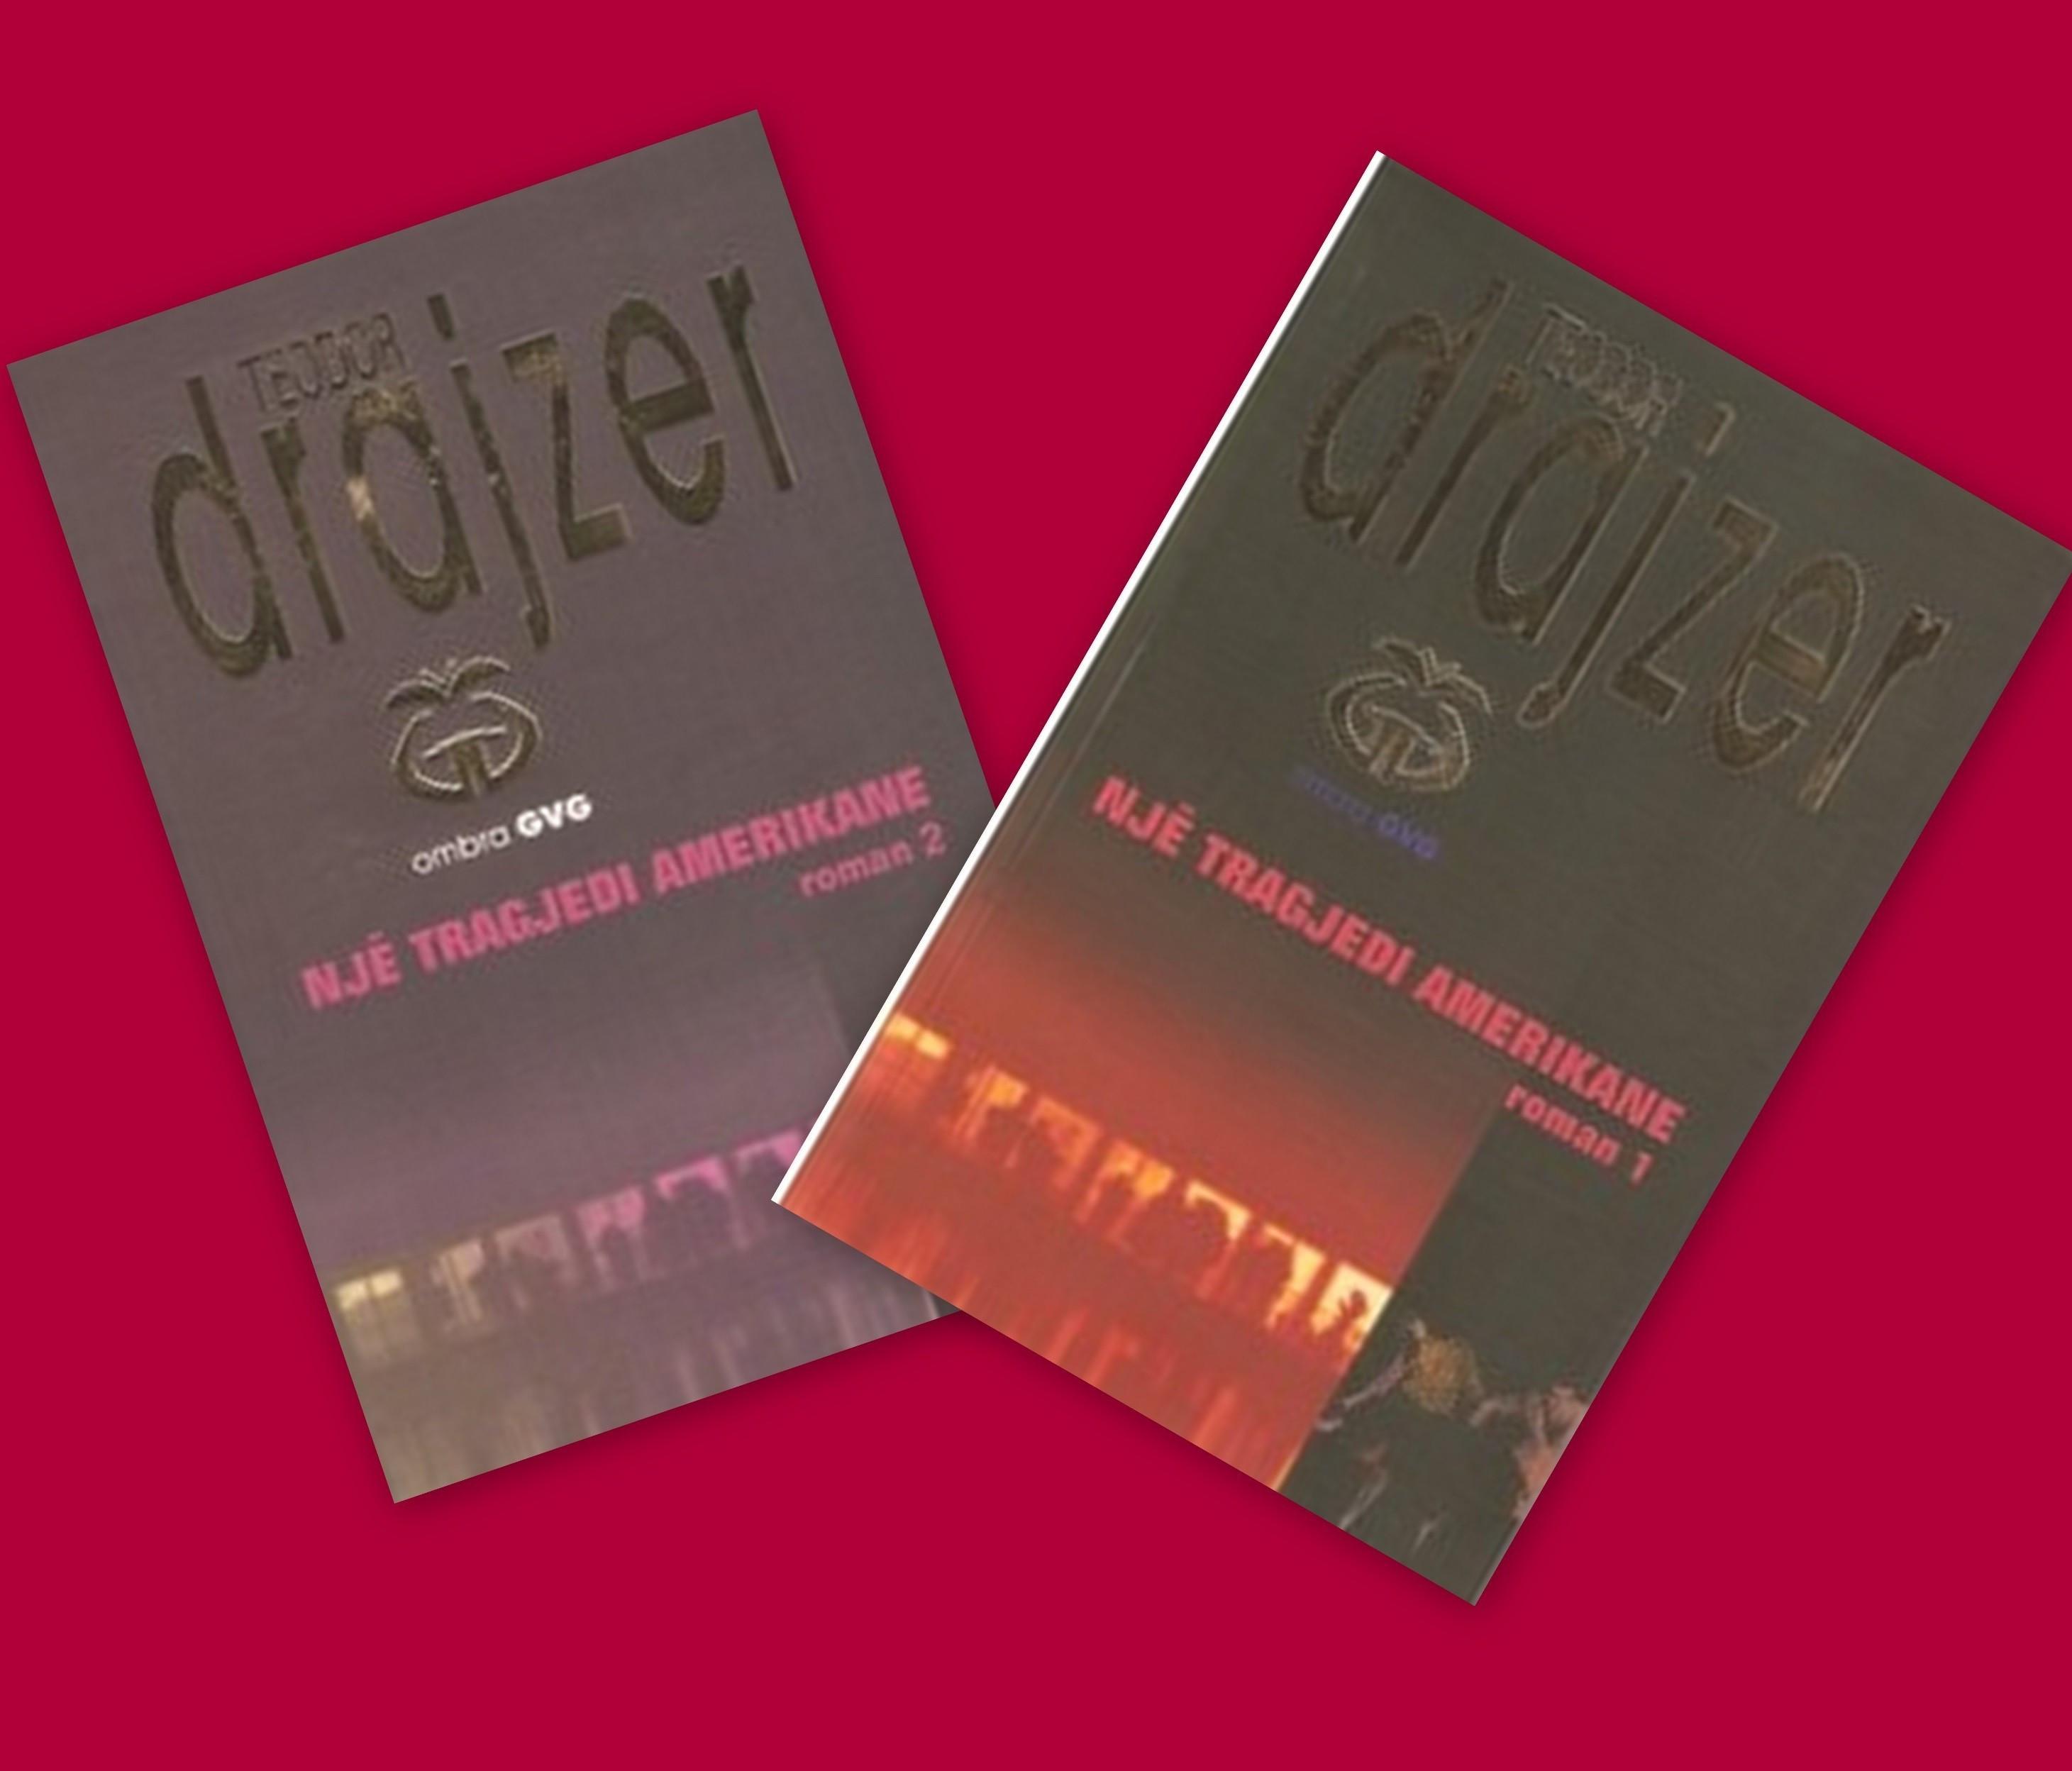 Nje tragjedi amerikane – i plote, set 2 libra